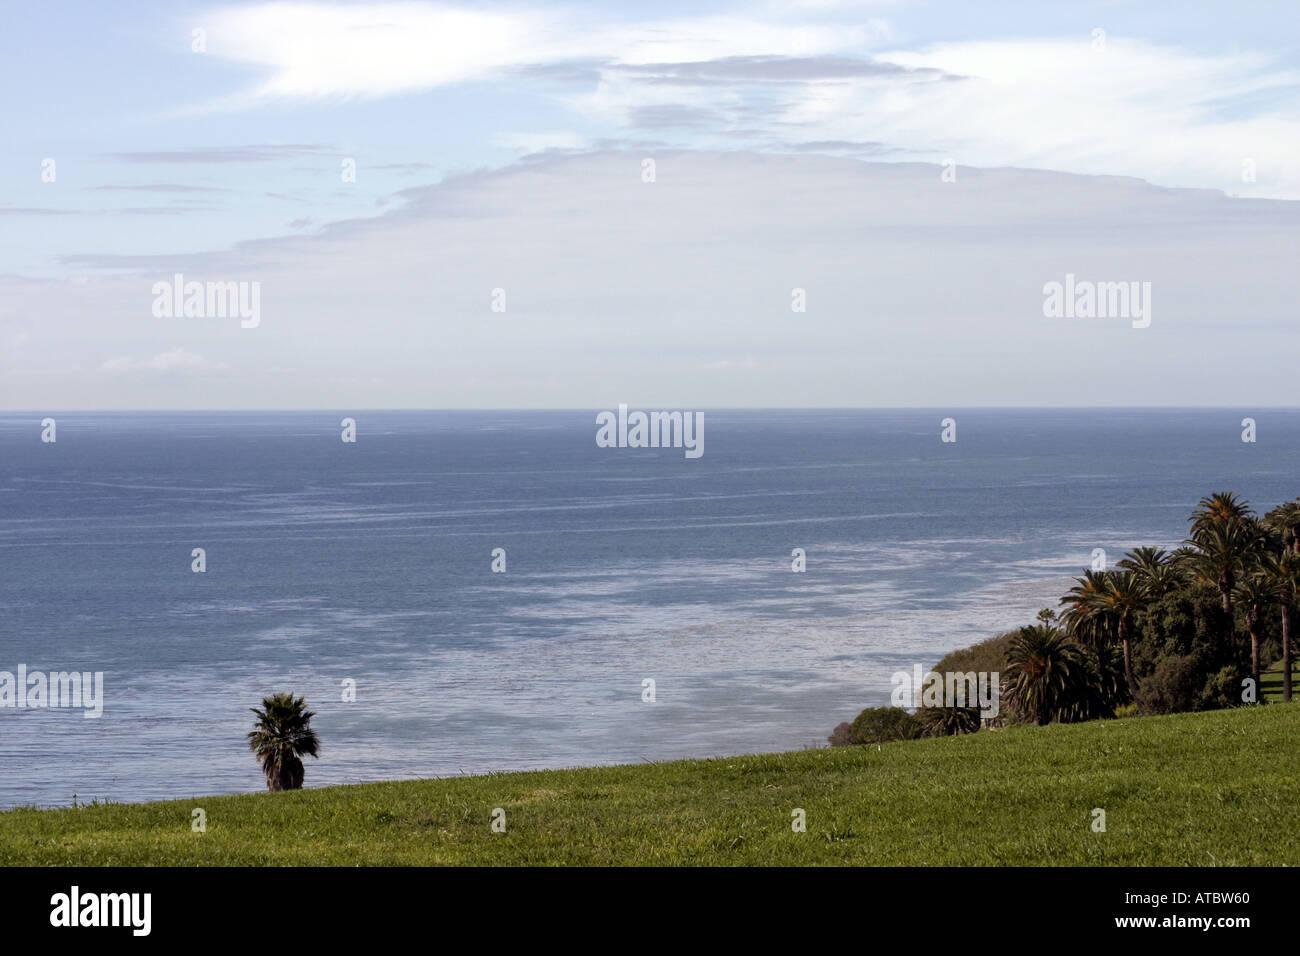 California - Stock Image